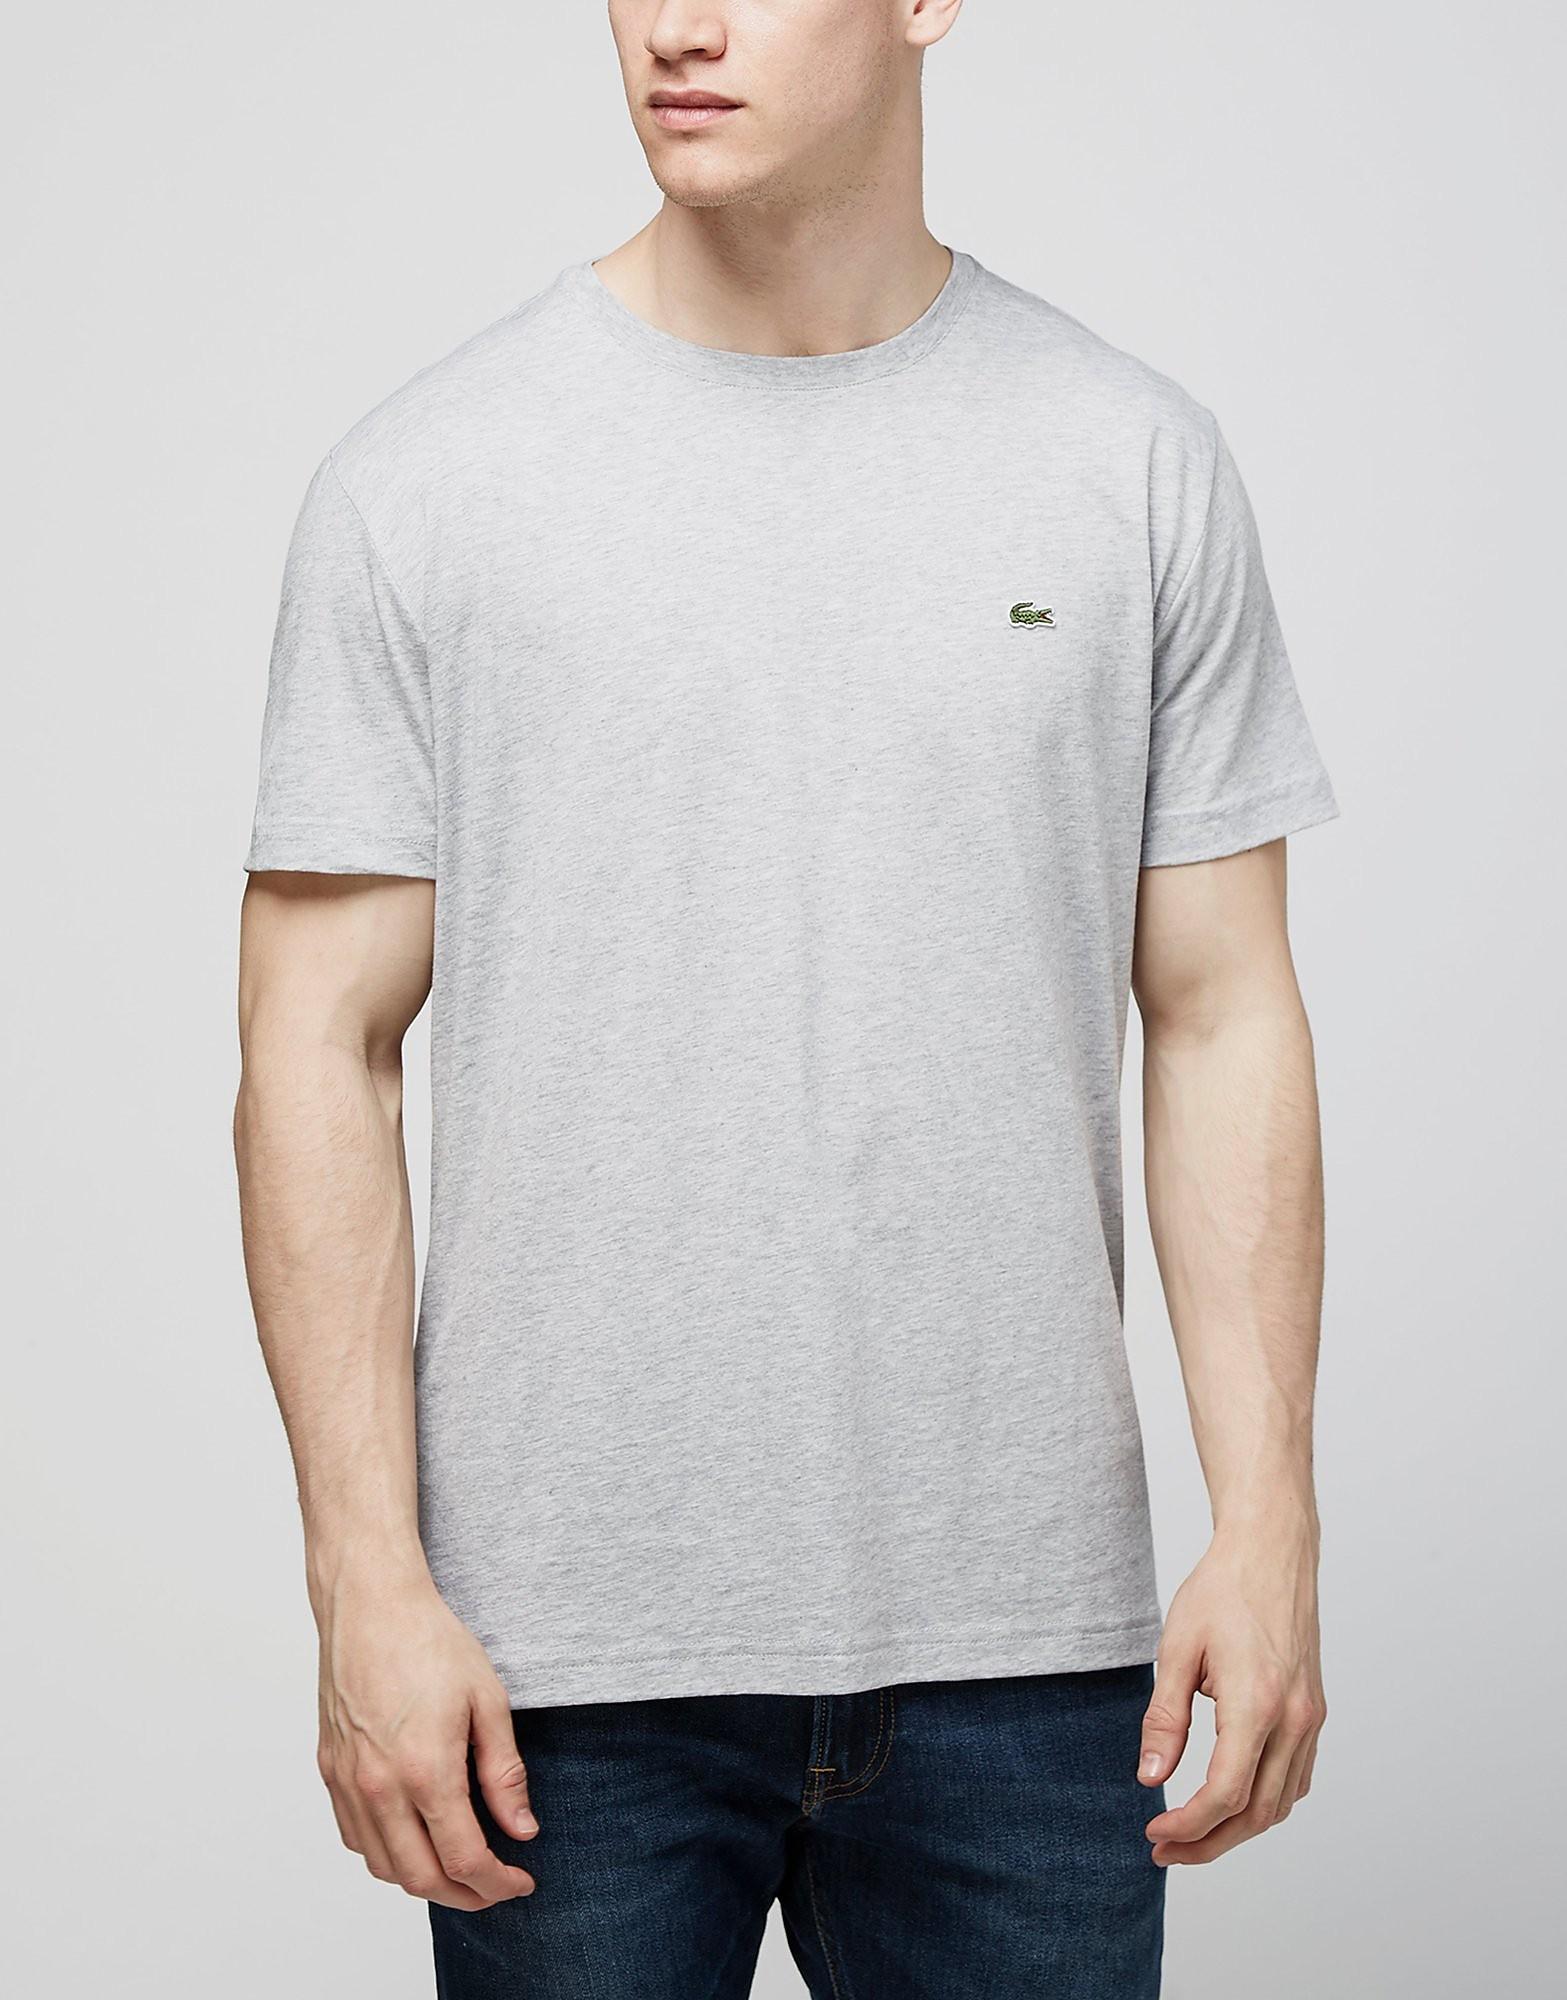 Lacoste Crew Neck T-Shirt